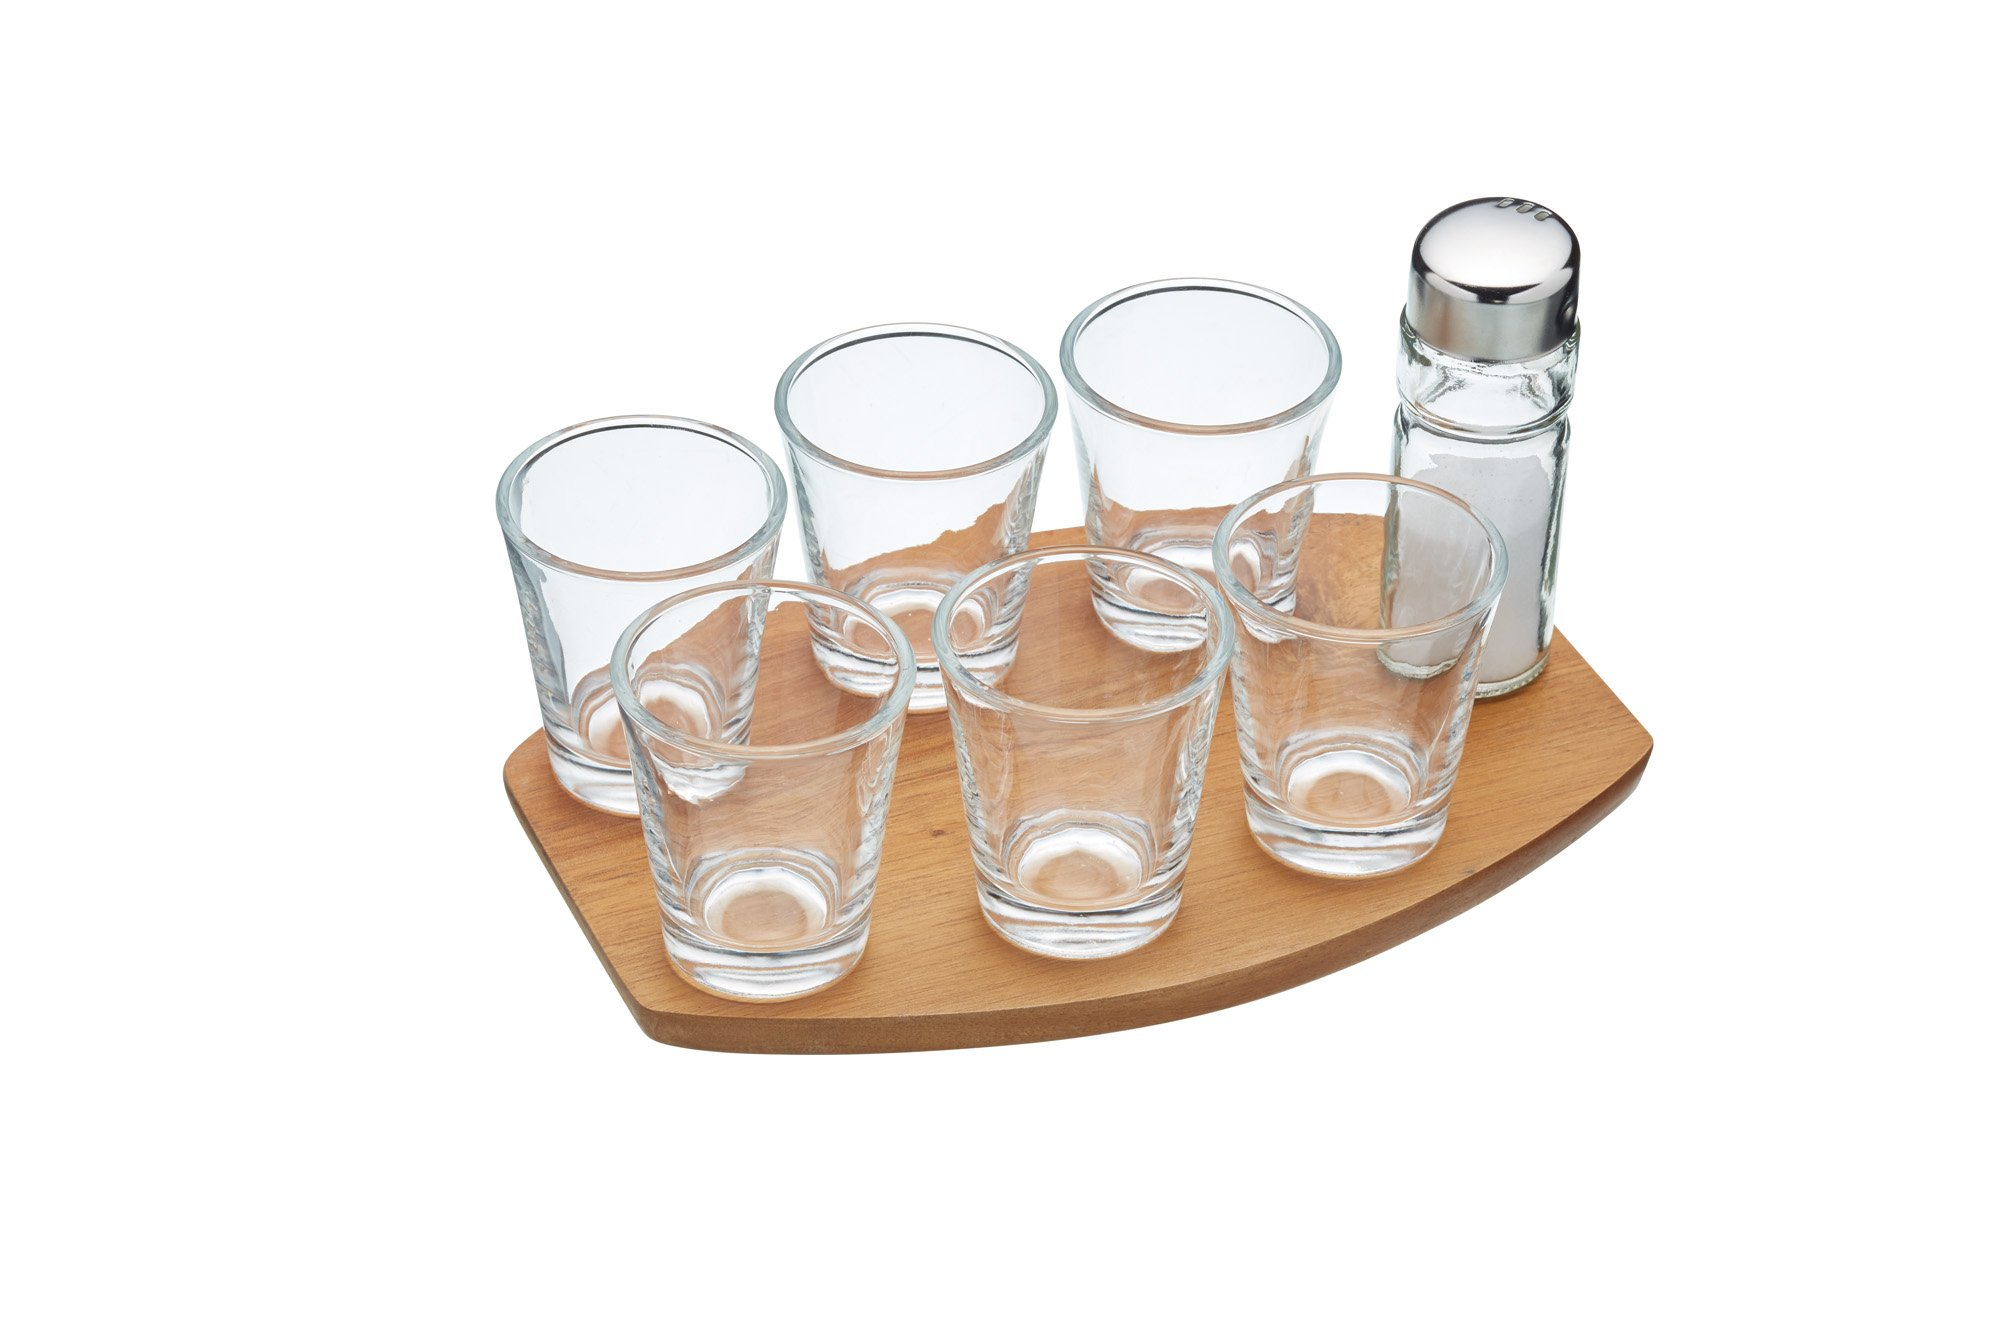 BarCraft BCTEQUILA KitchenCraft Tequila Shot Glass Gift Set, 8 Pieces, Gift Box, 20 x 13.9 x 1 cm